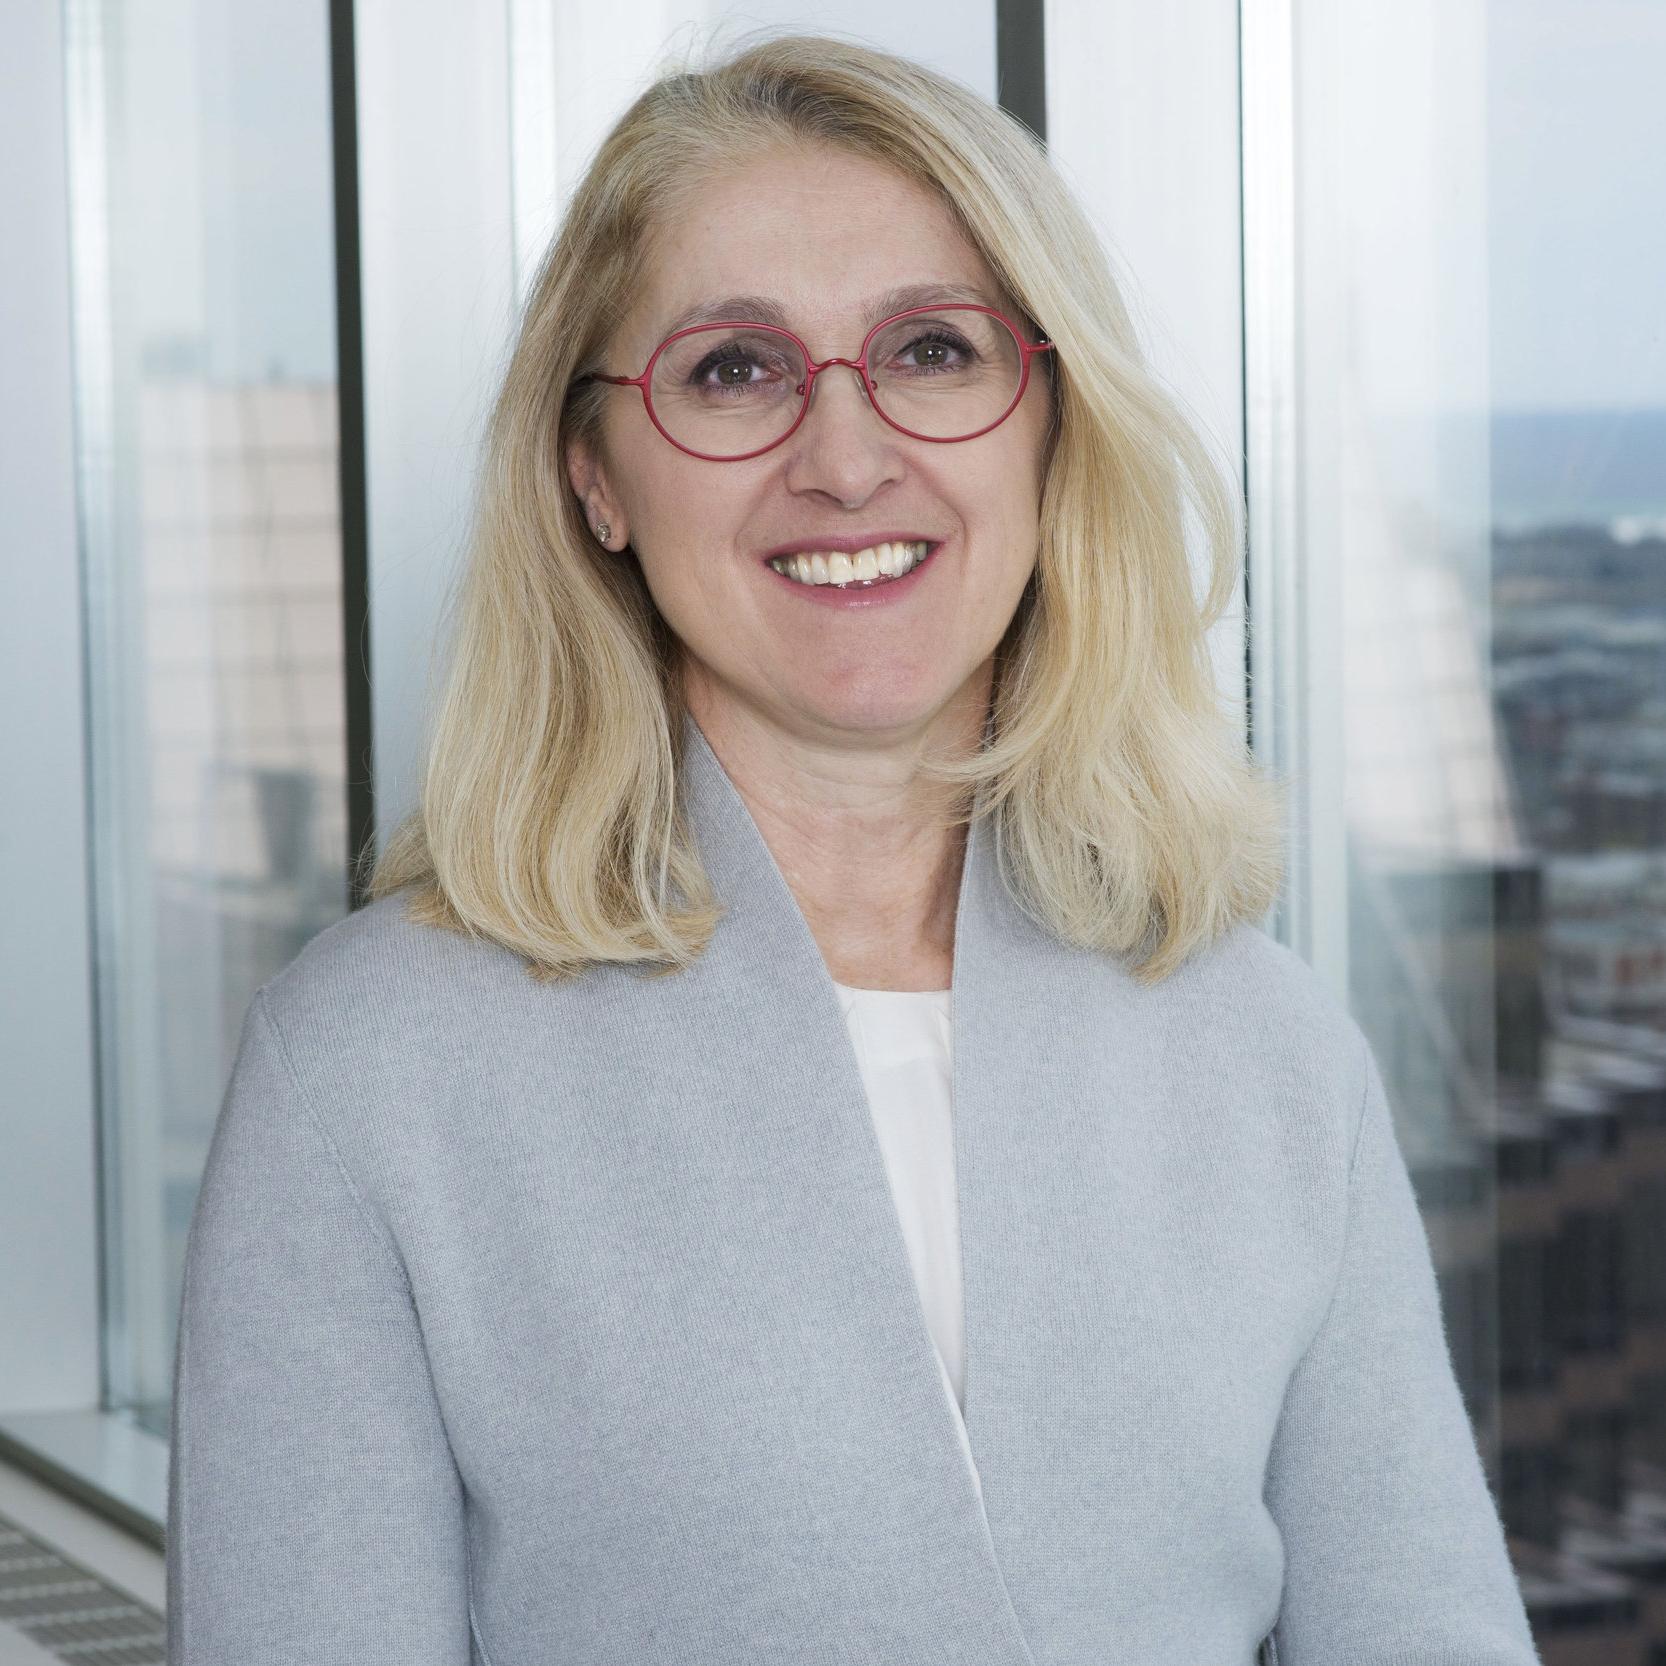 Natalie Vukovich - Partner, Daoust Vukovich LLP